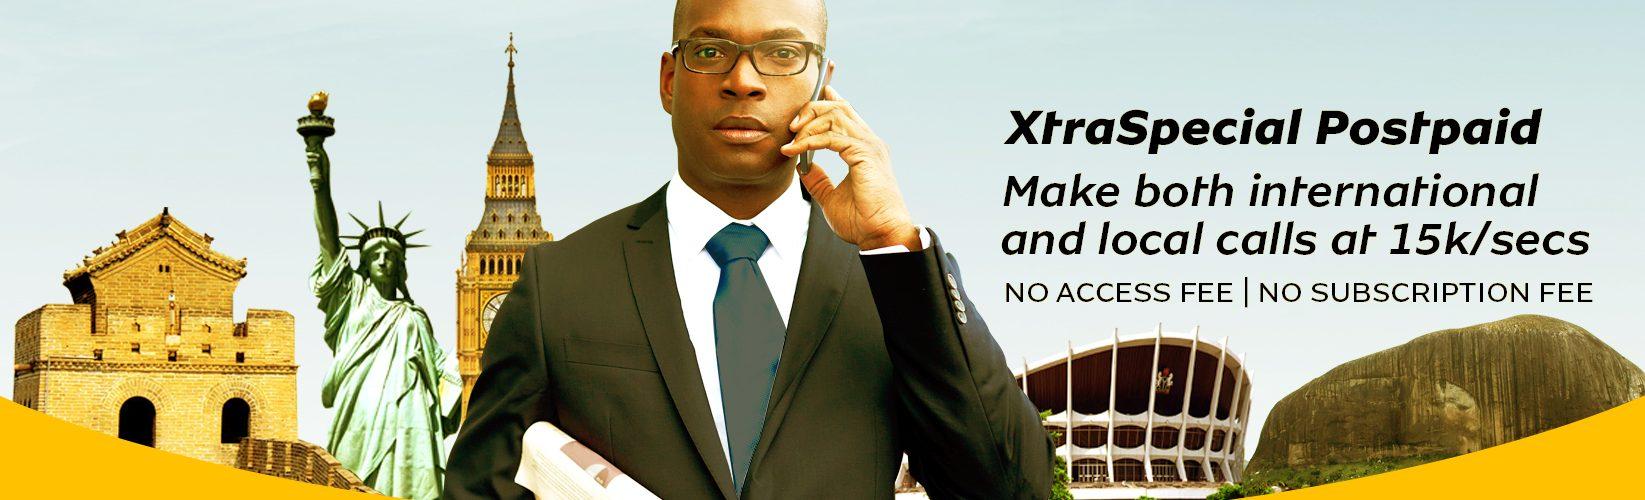 MTN XtraSpecial Postpaid